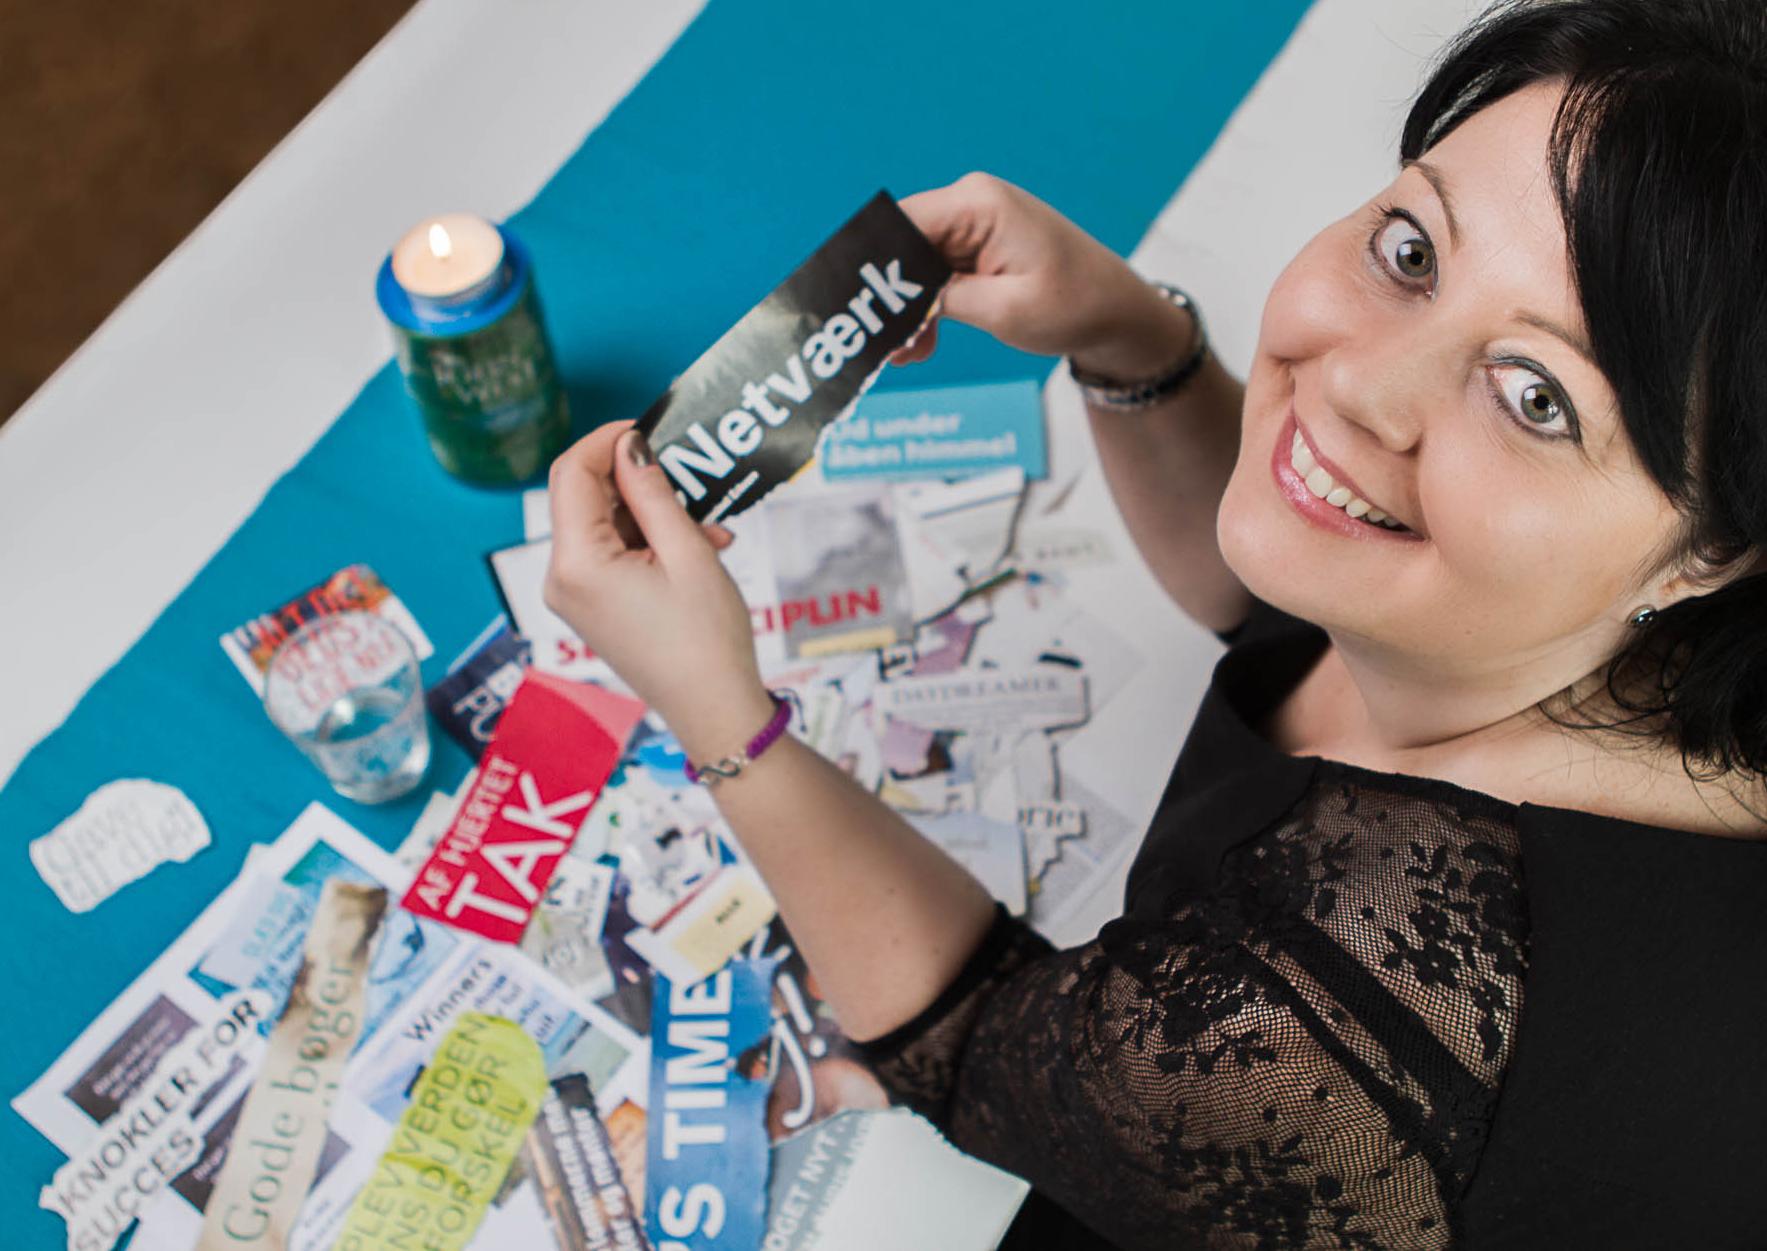 Networkingekspert og Foredragsholder Carina Heckscher - Foto: Susanna Zenani